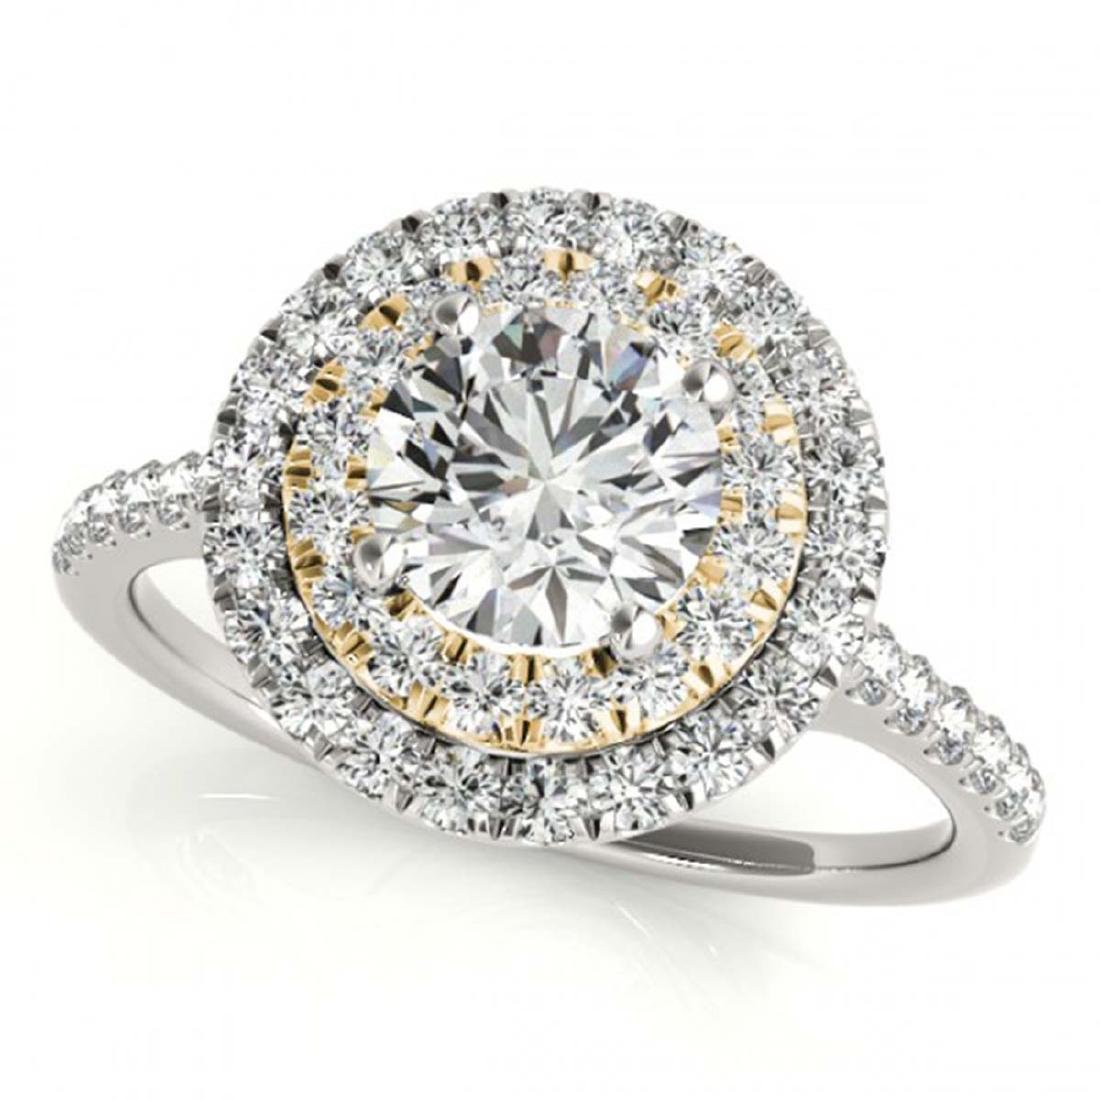 1.25 ctw VS/SI Diamond Solitaire Halo Ring 18K White &